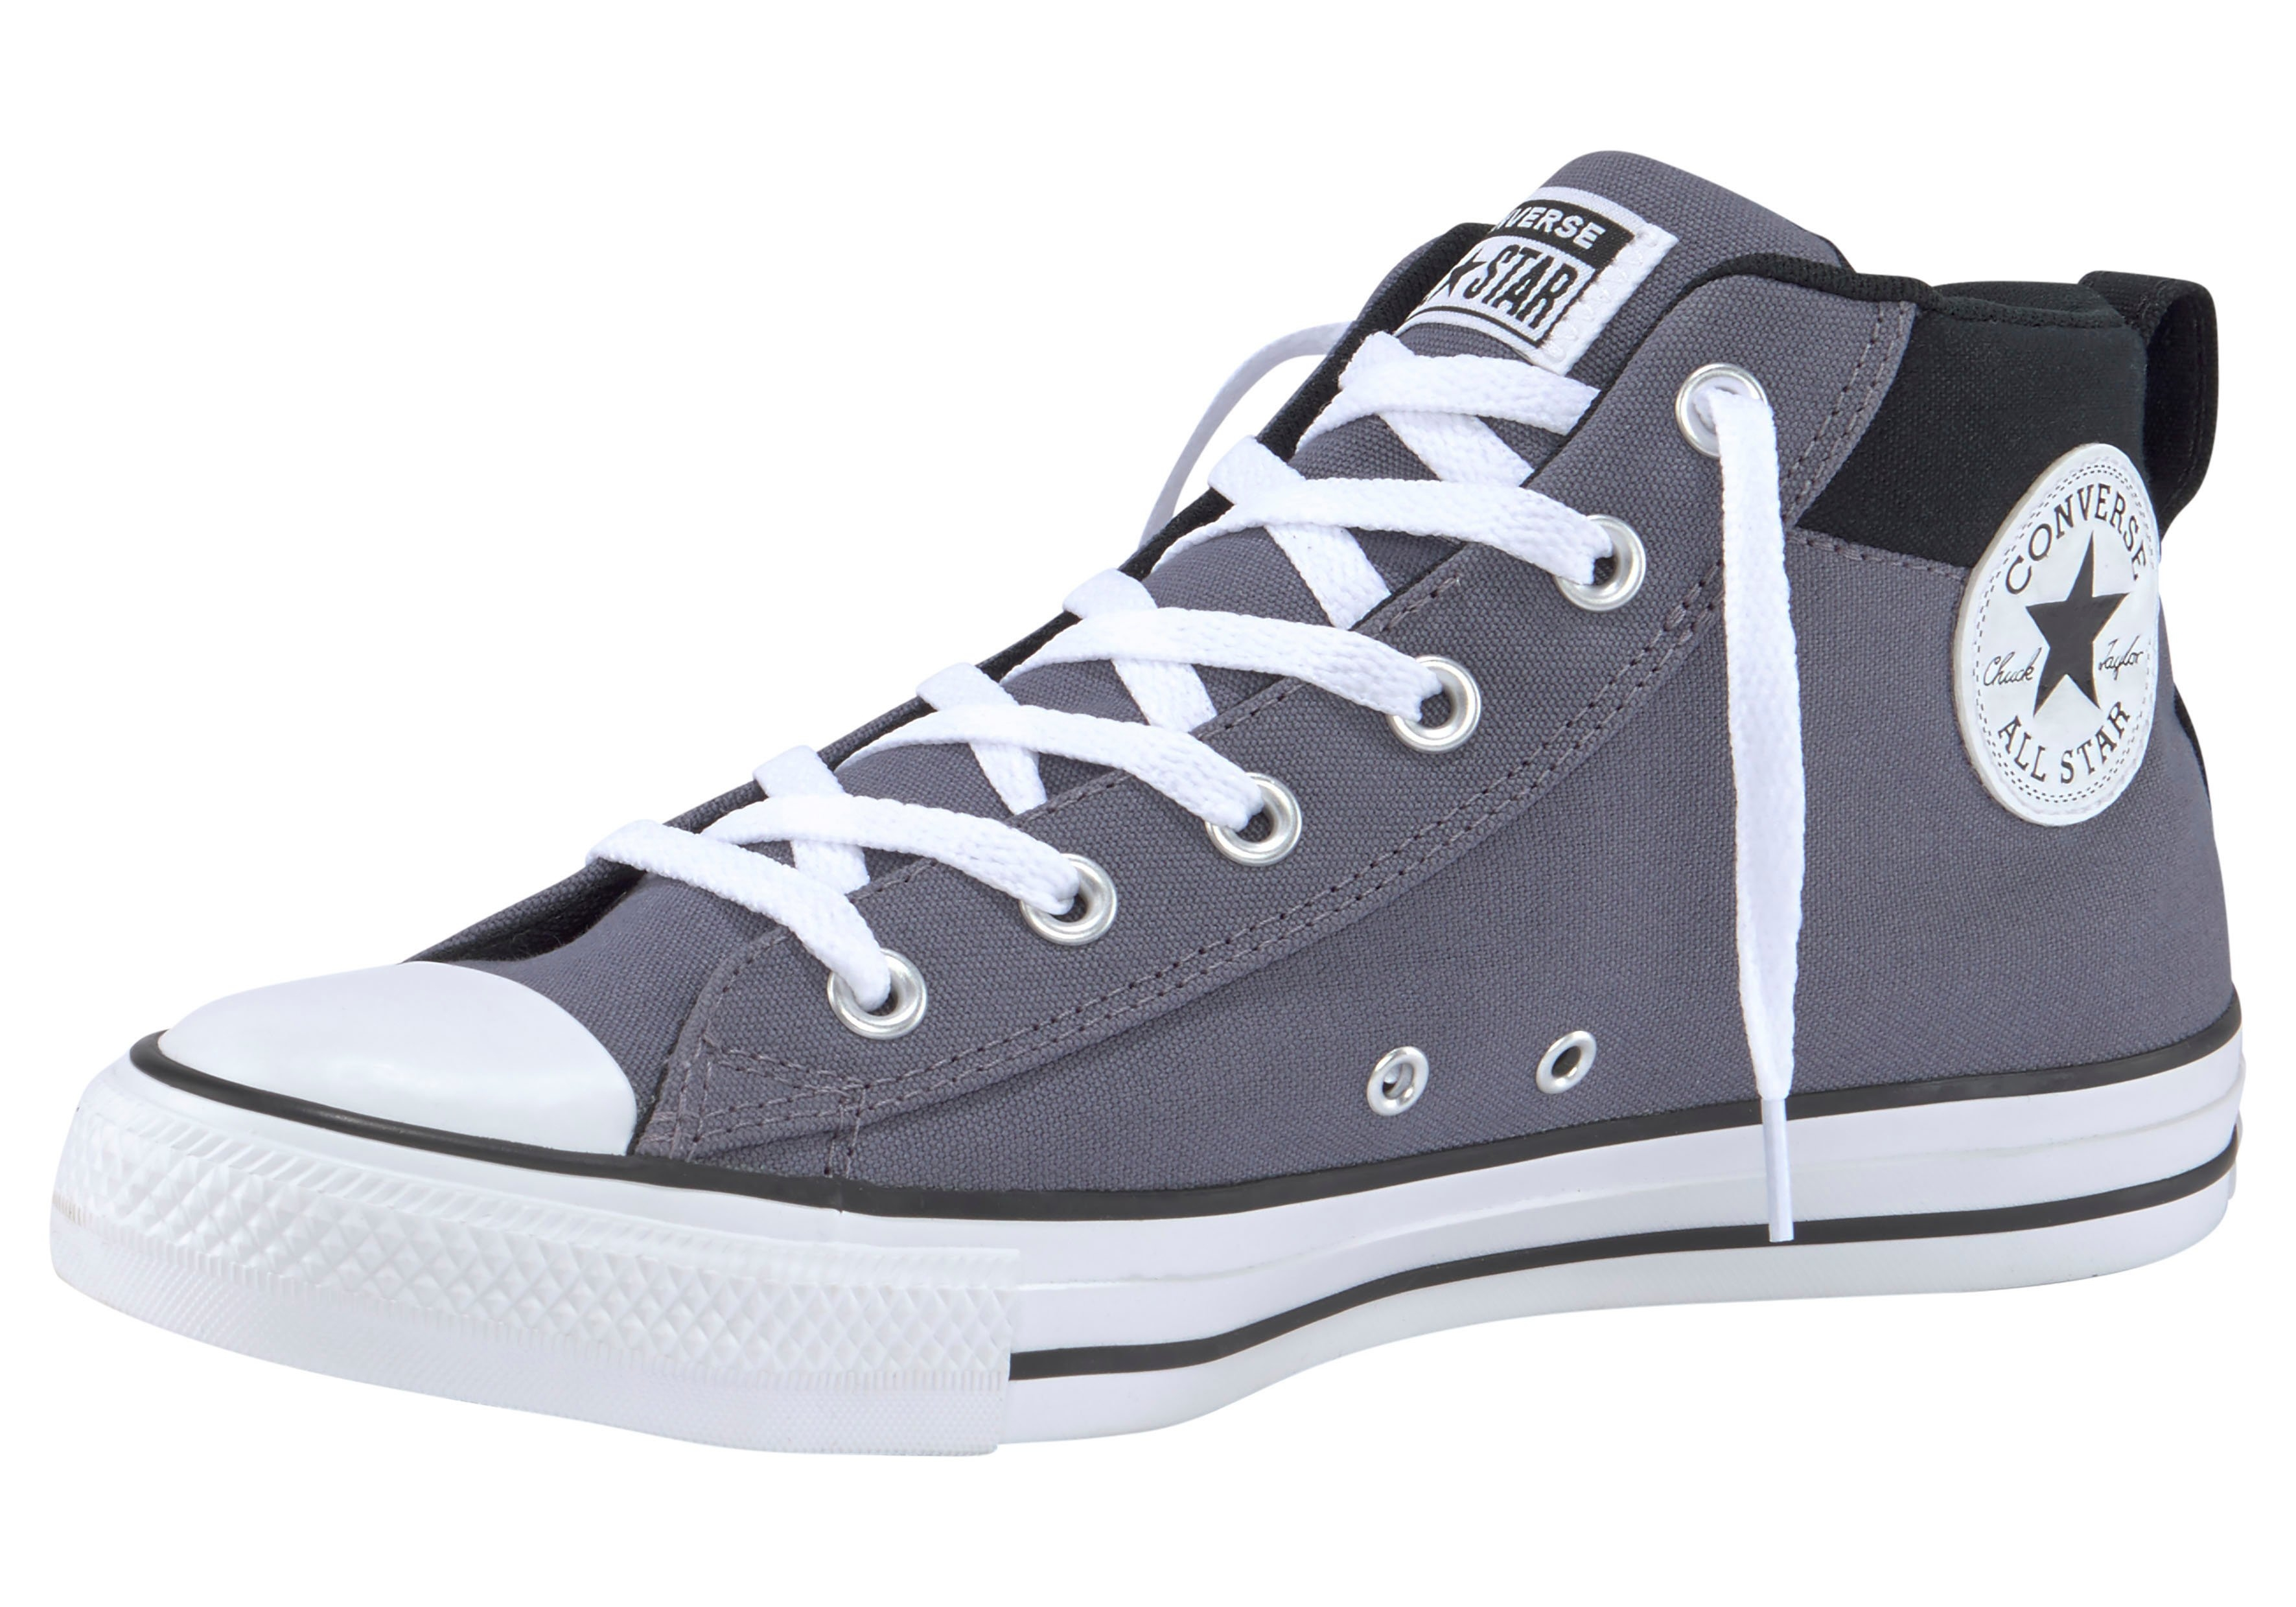 Converse sneakers »CHUCK TAYLOR ALL STAR STREET SEASONAL MID« voordelig en veilig online kopen